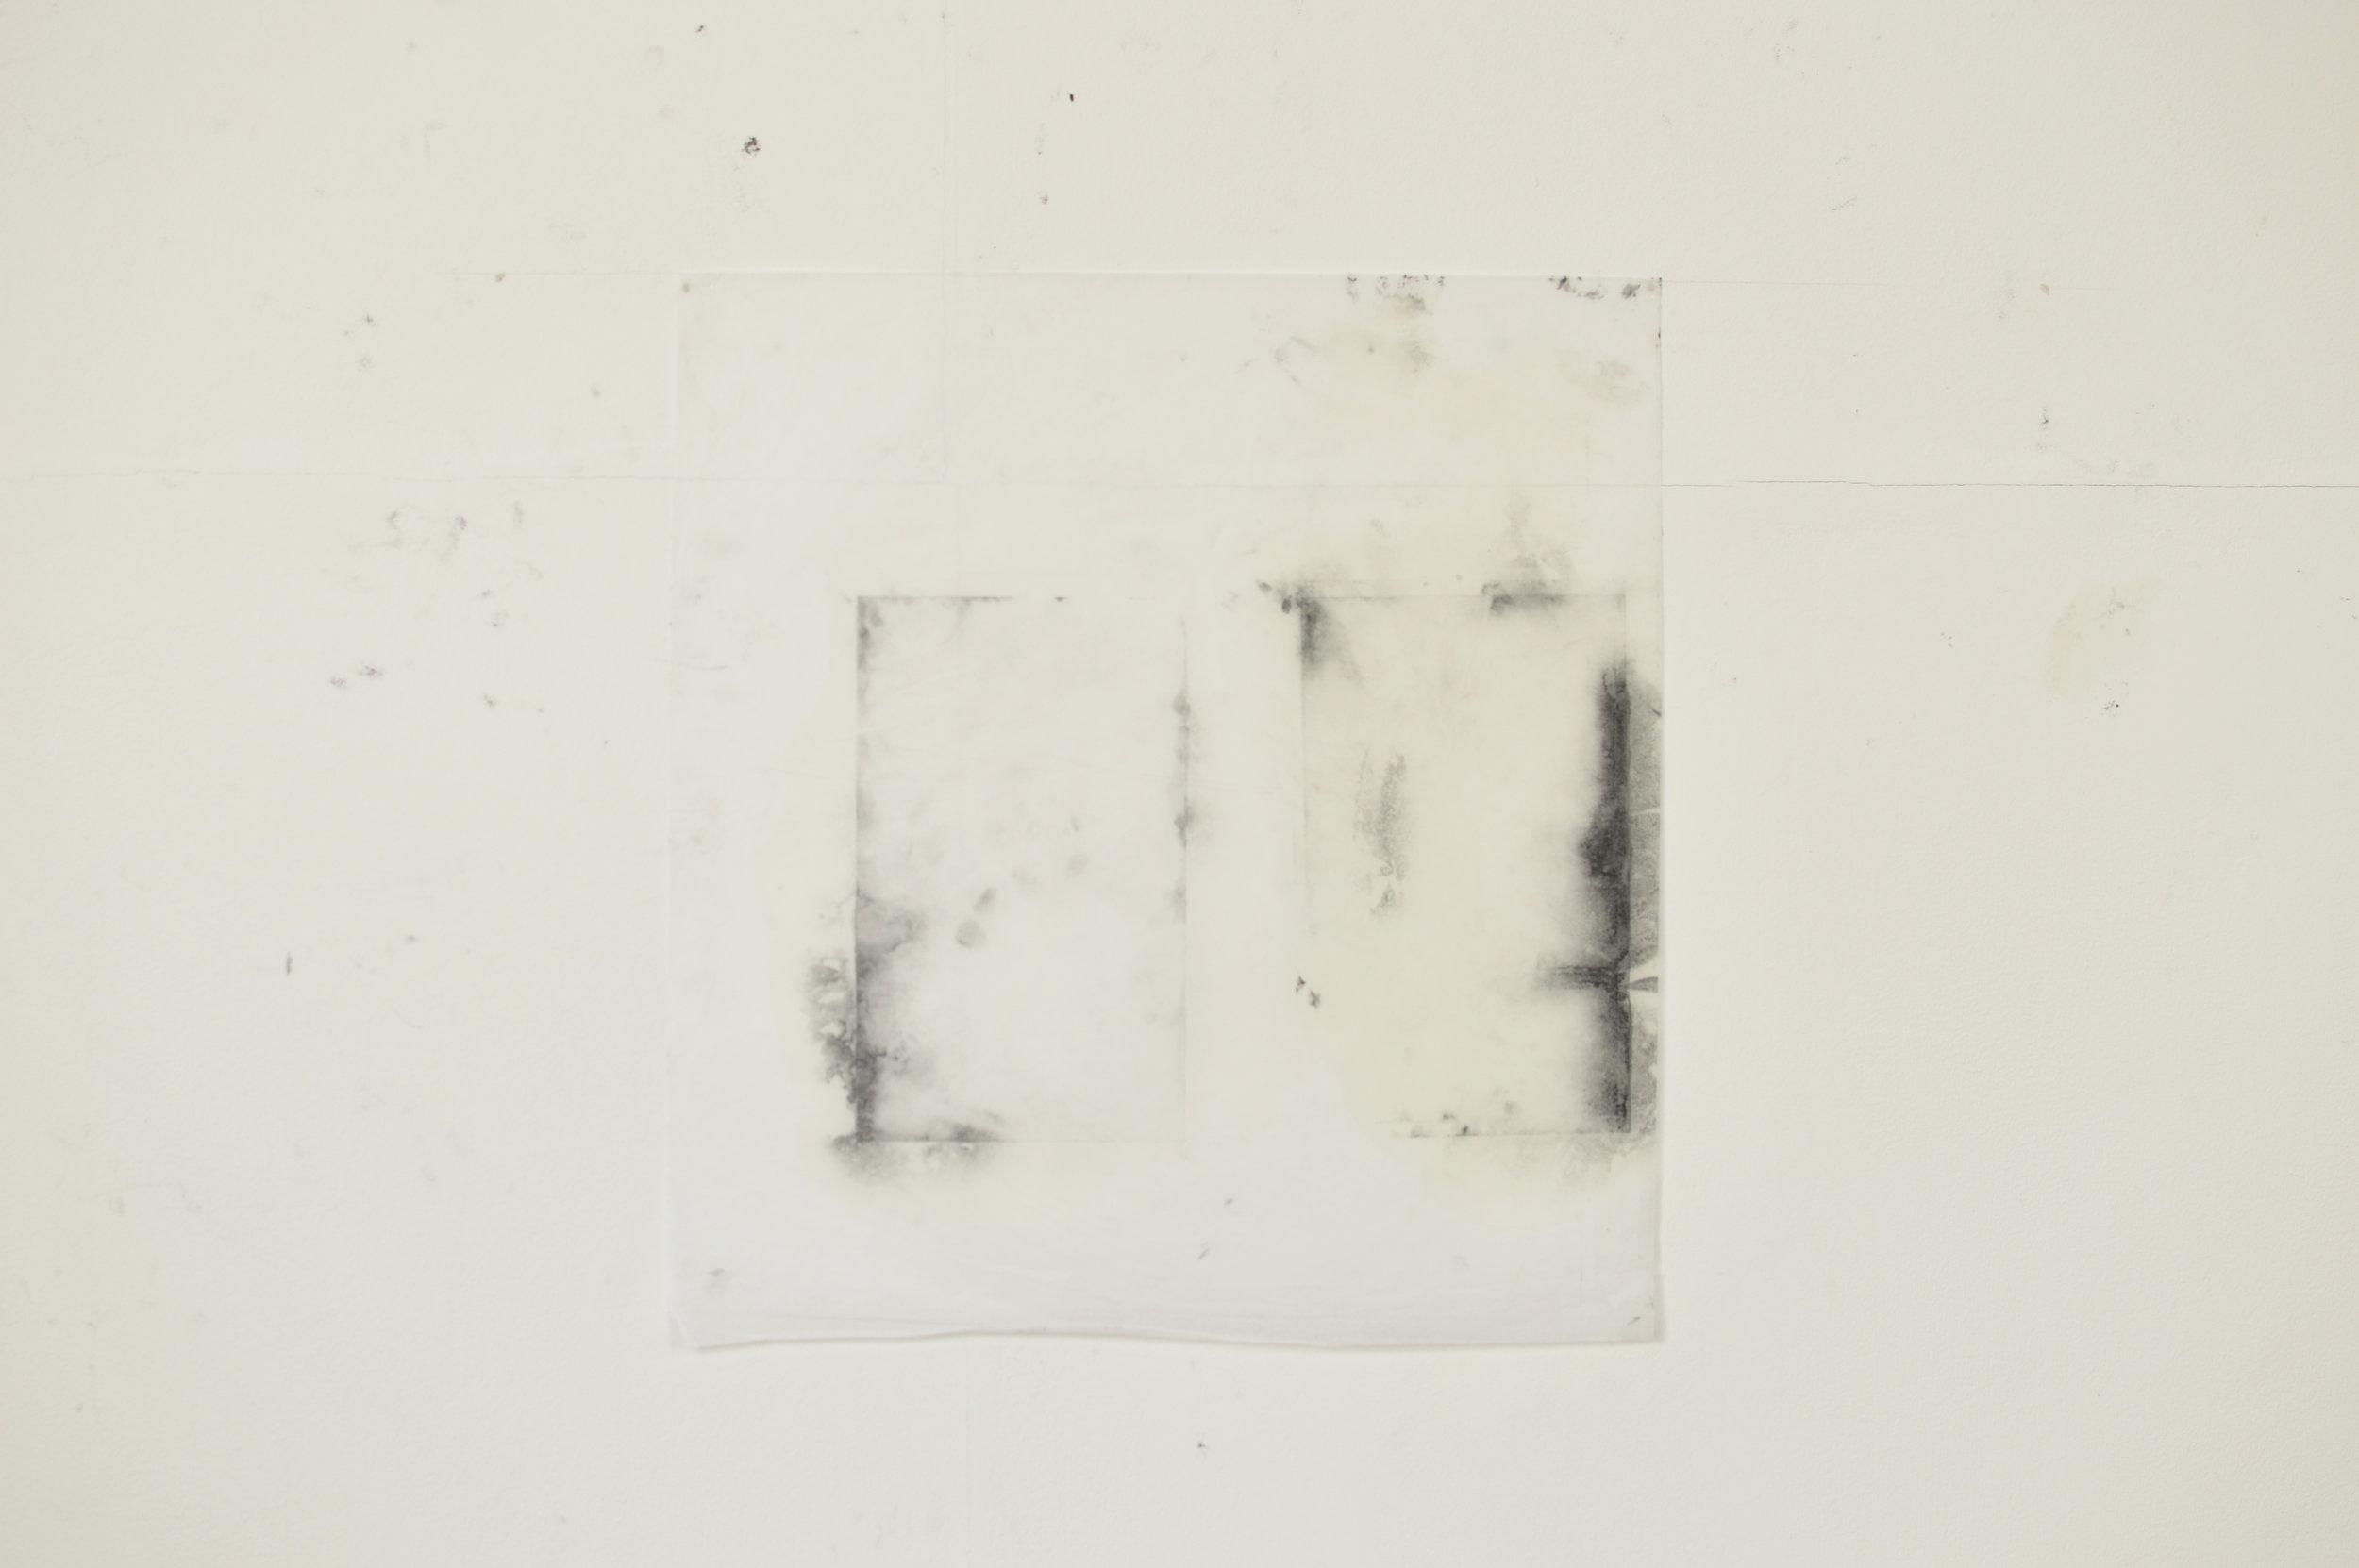 Tissue paper, pigment, copperplate oil, white spirit  70cm x 56cm